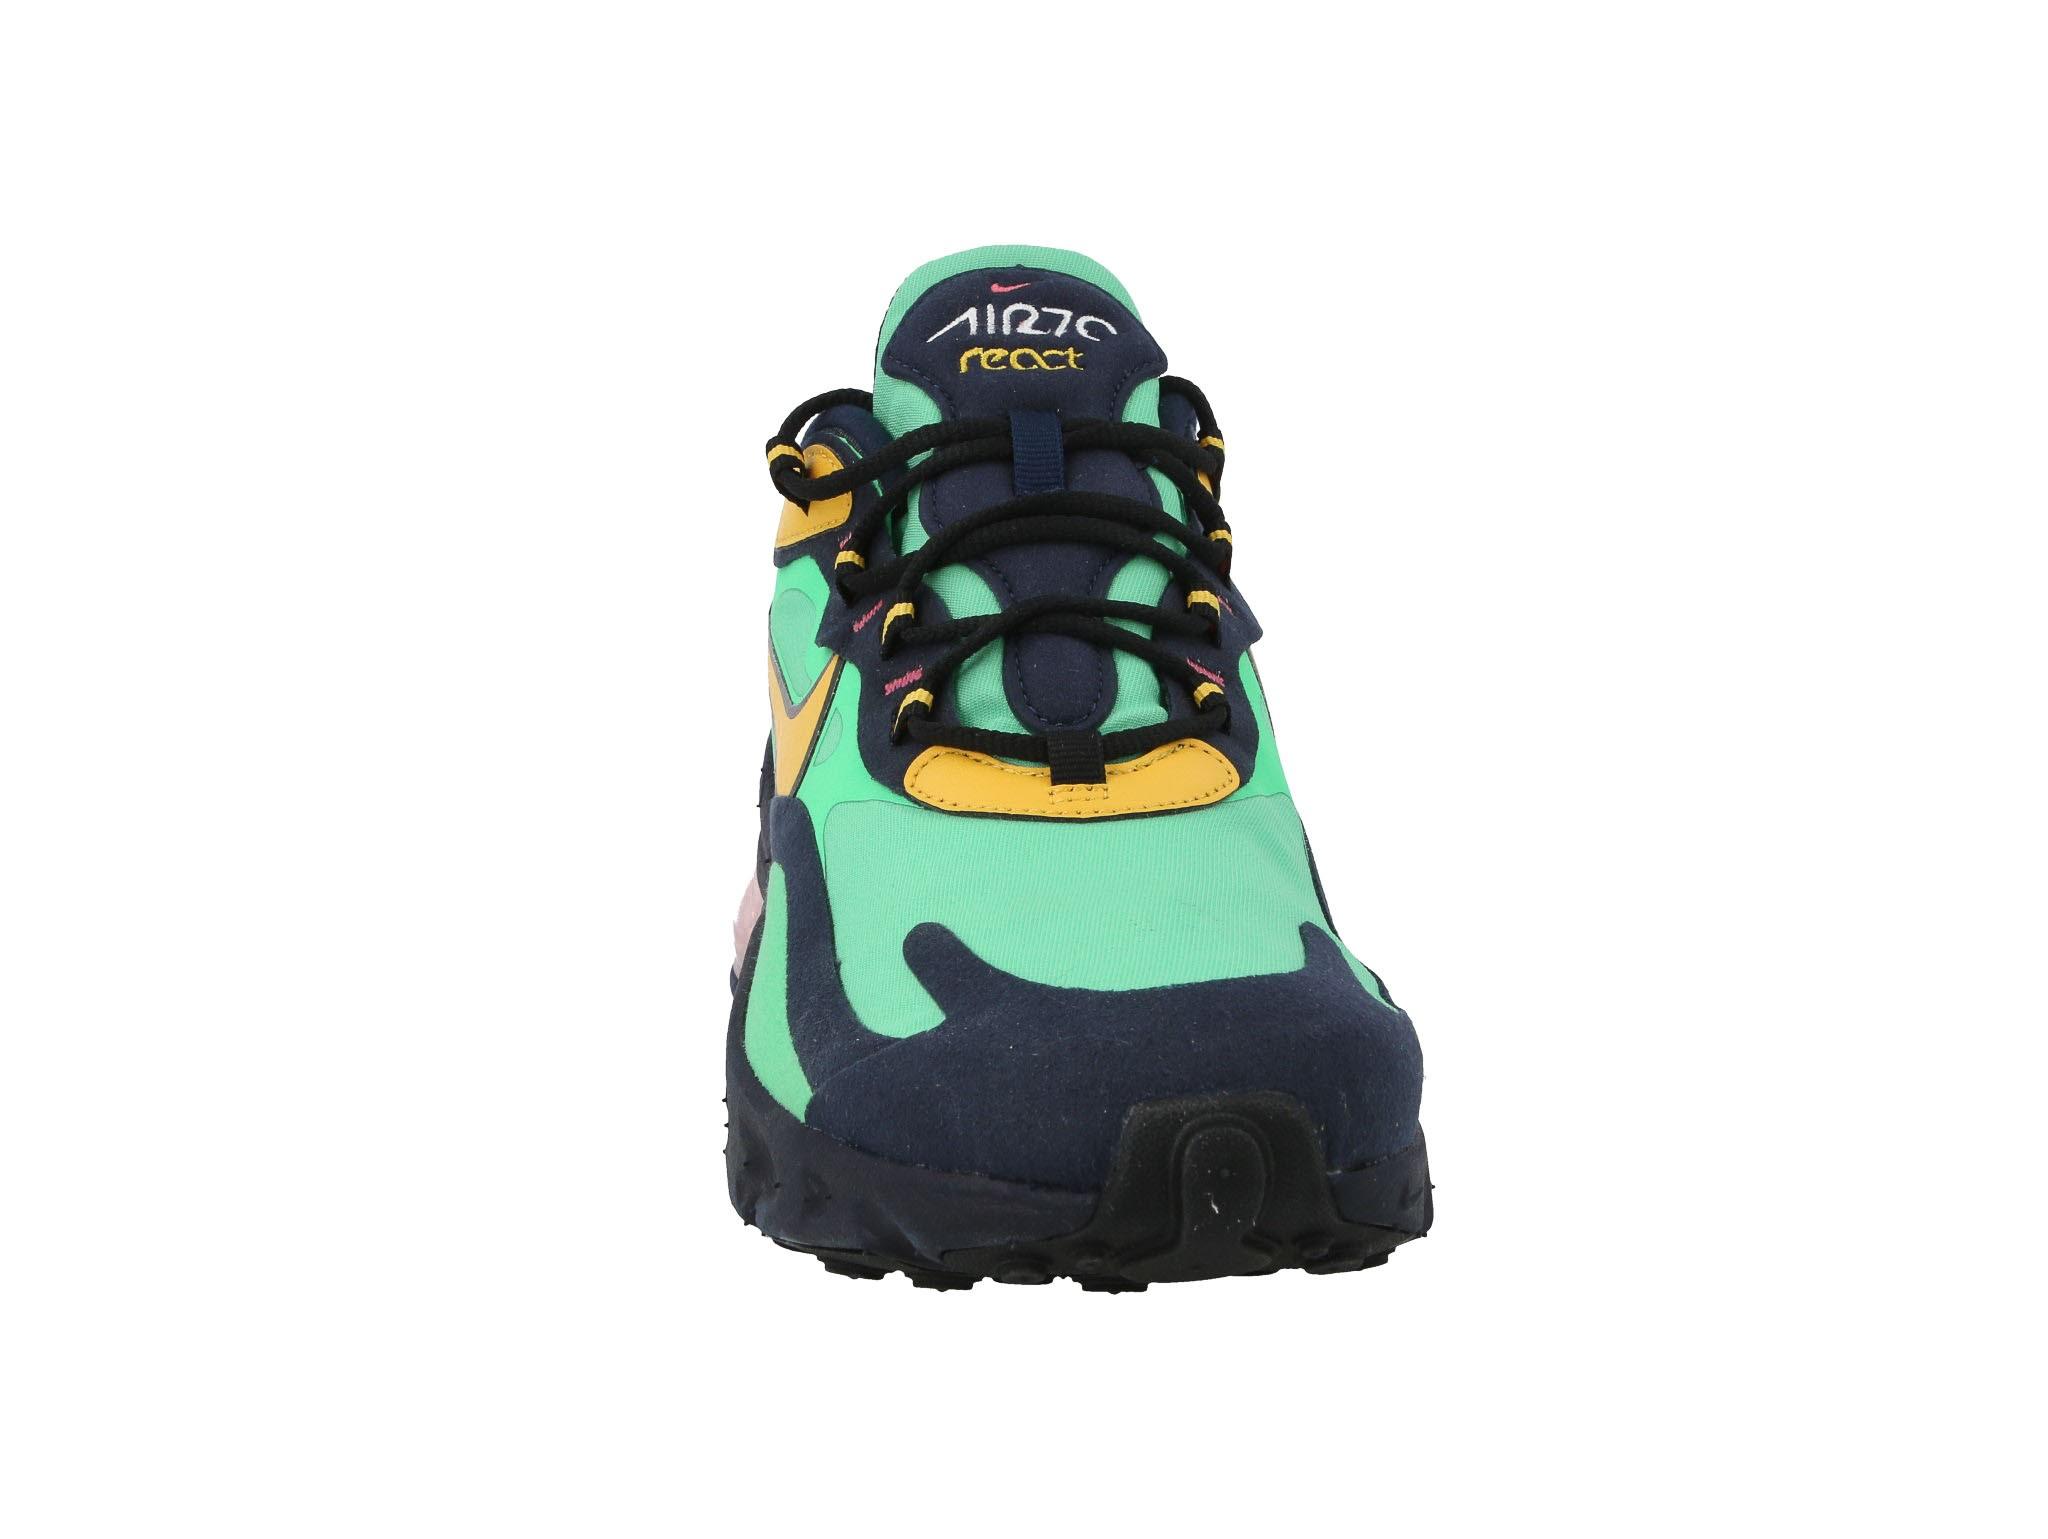 Nike Air Max 270 React in bunt AO4971 002 | Nike stiefel